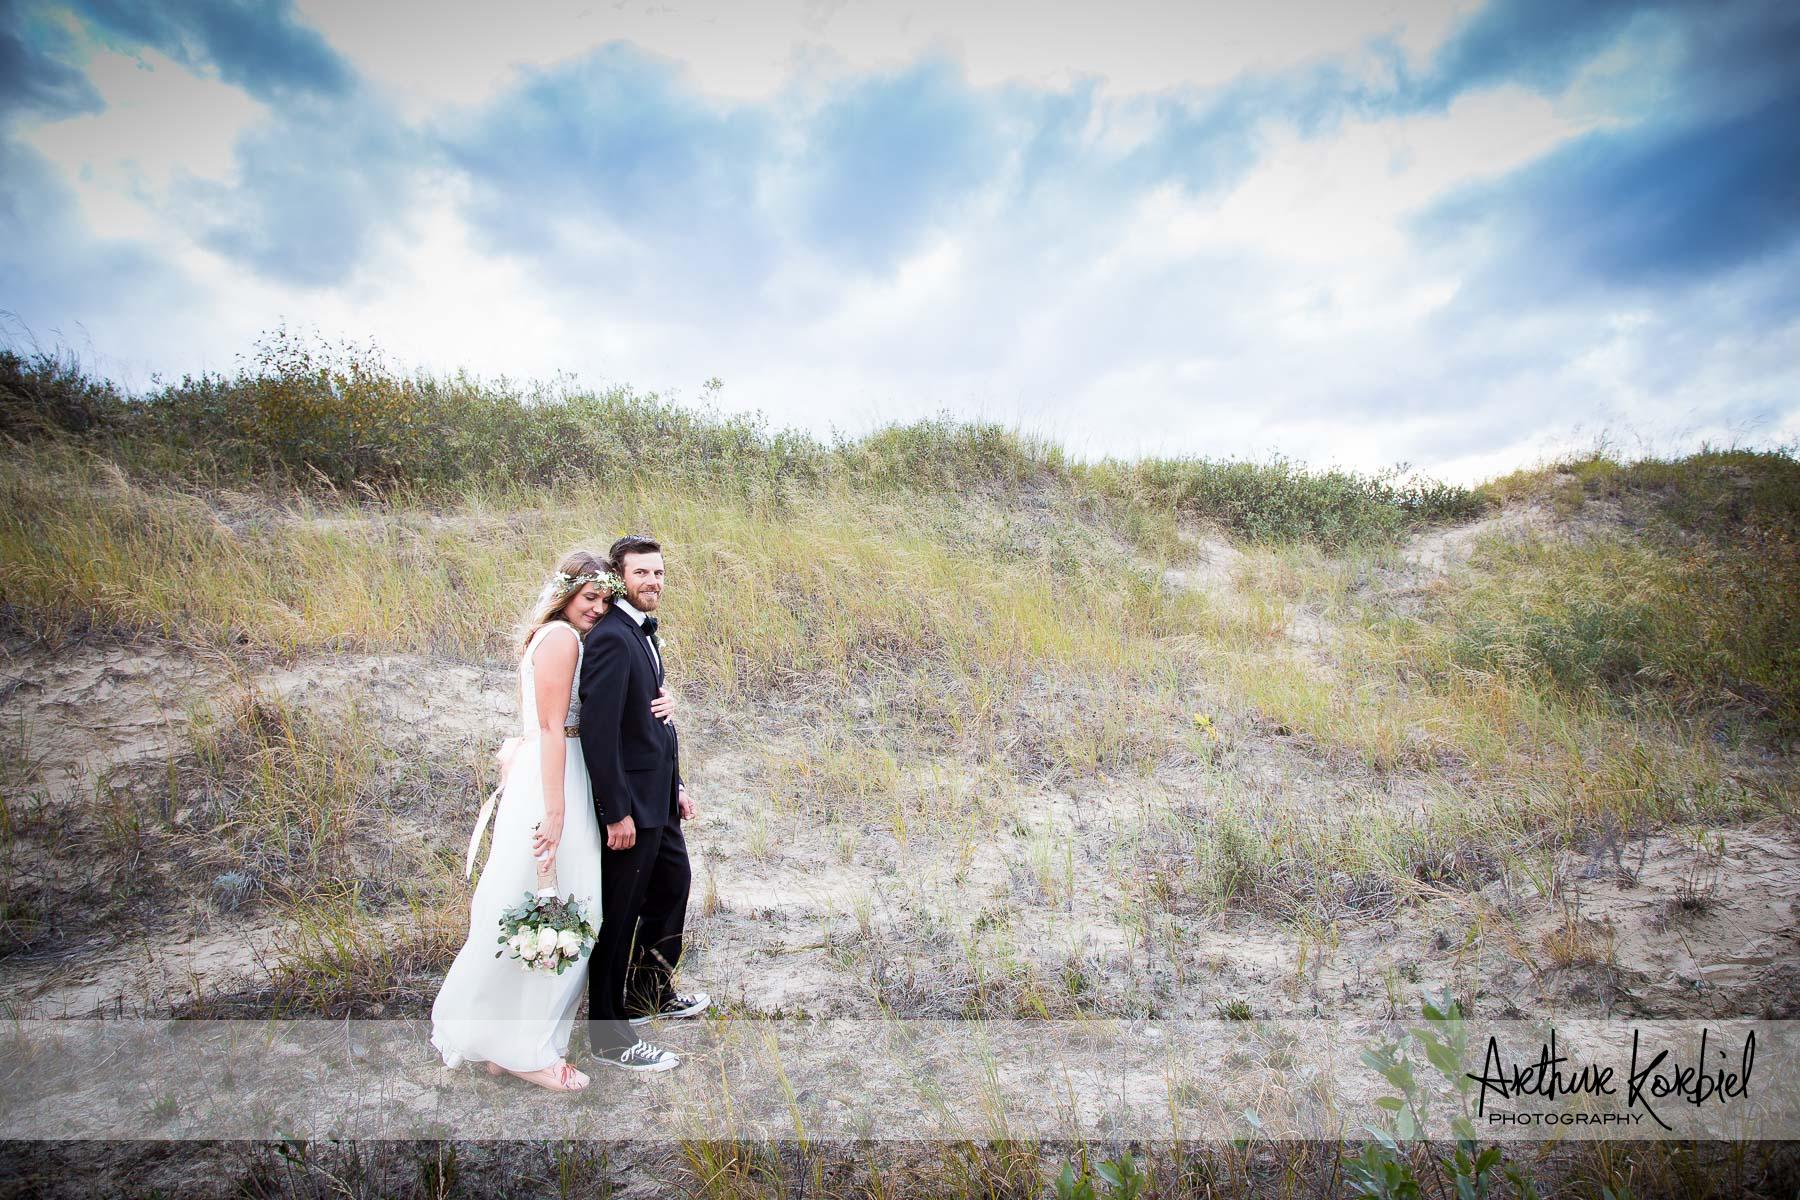 Arthur Korbiel Photography - London Wedding Photographer - Rogers-041.jpg